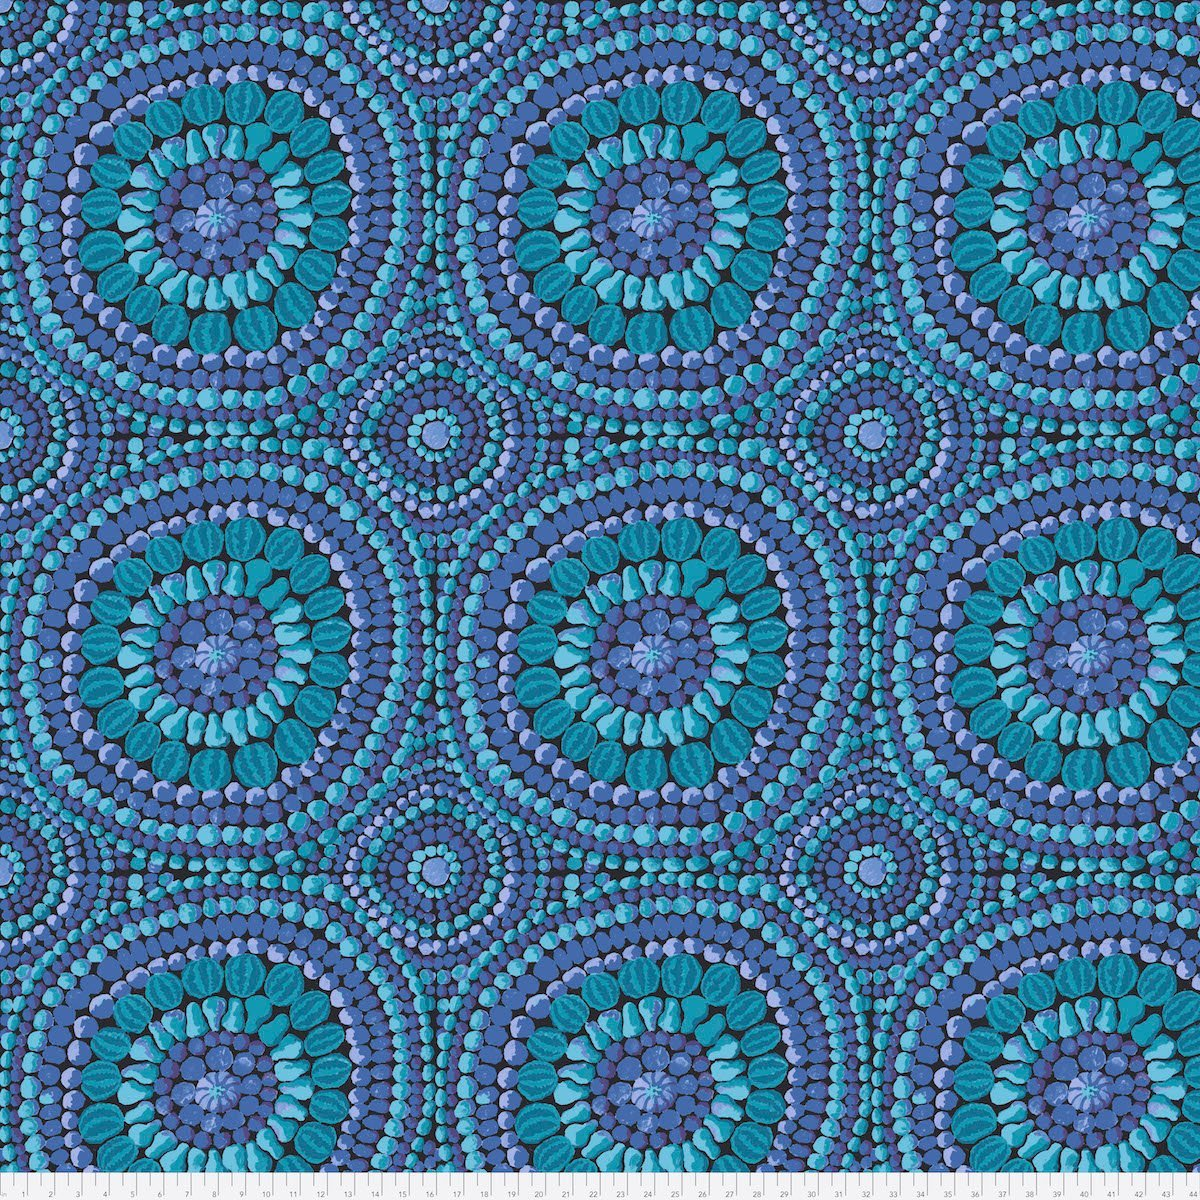 1-1/8 Yard End of Bolt - Kaffe Fassett Backing Fabric - Mandala Blue - QBGP003.2BLUE